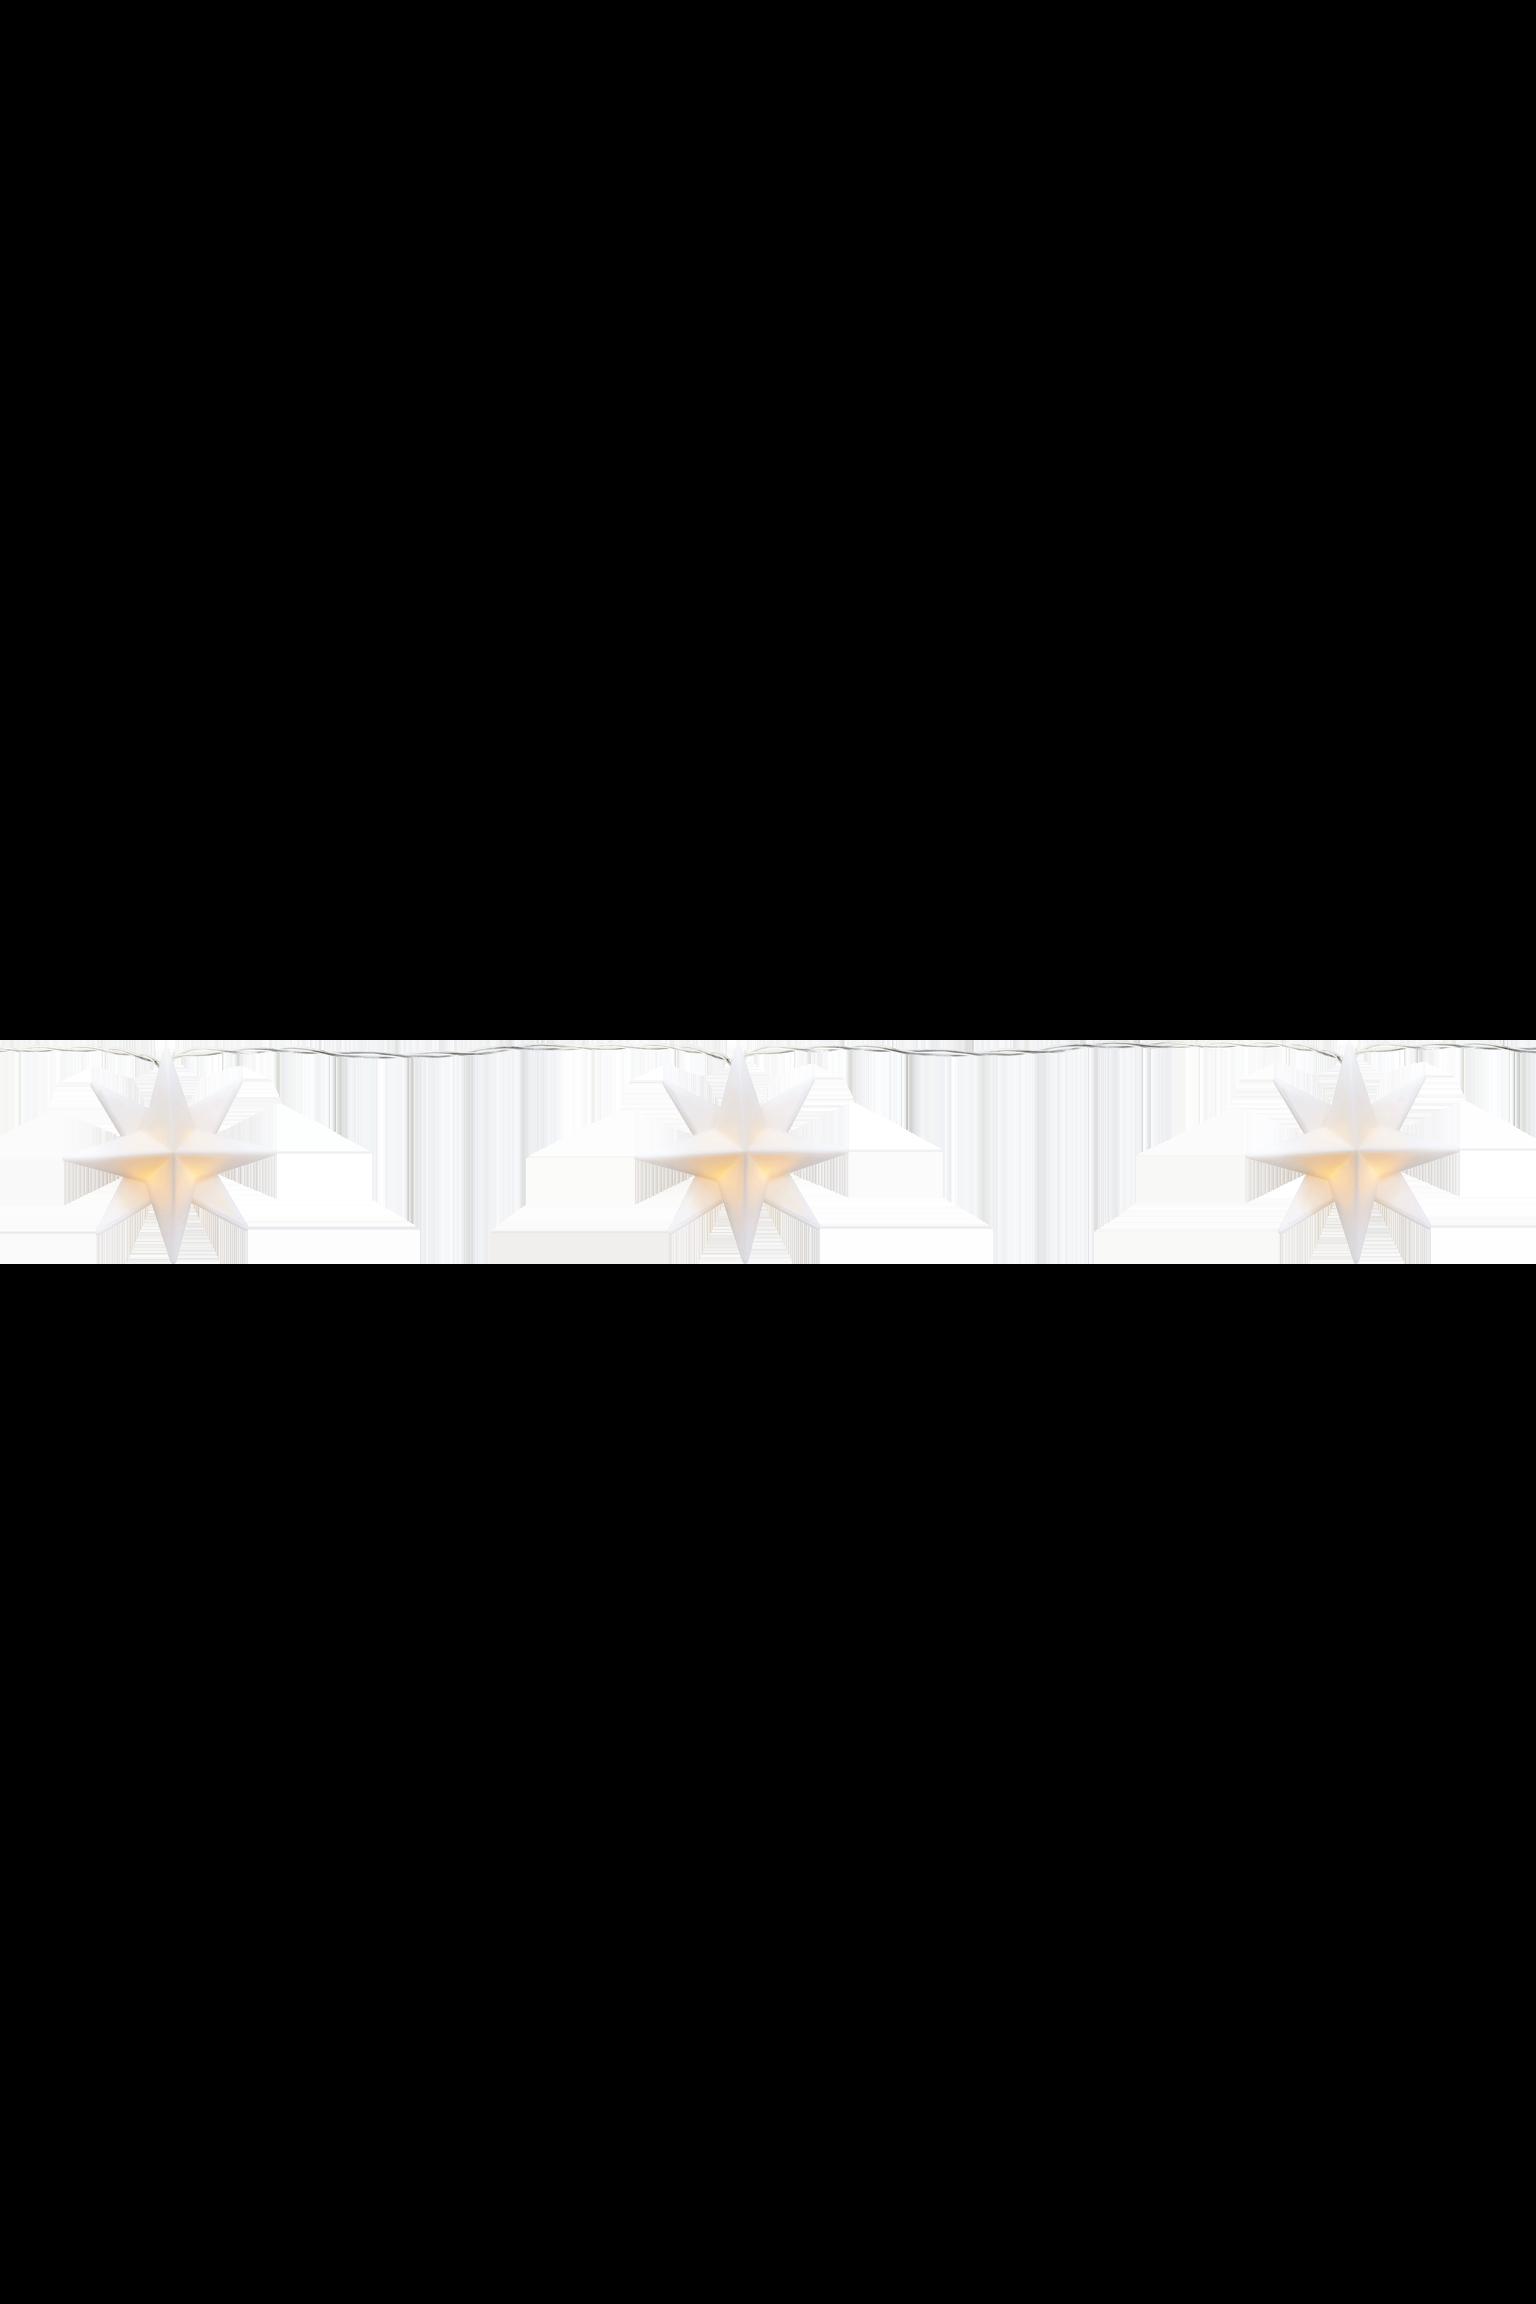 GRYT - Light chain star